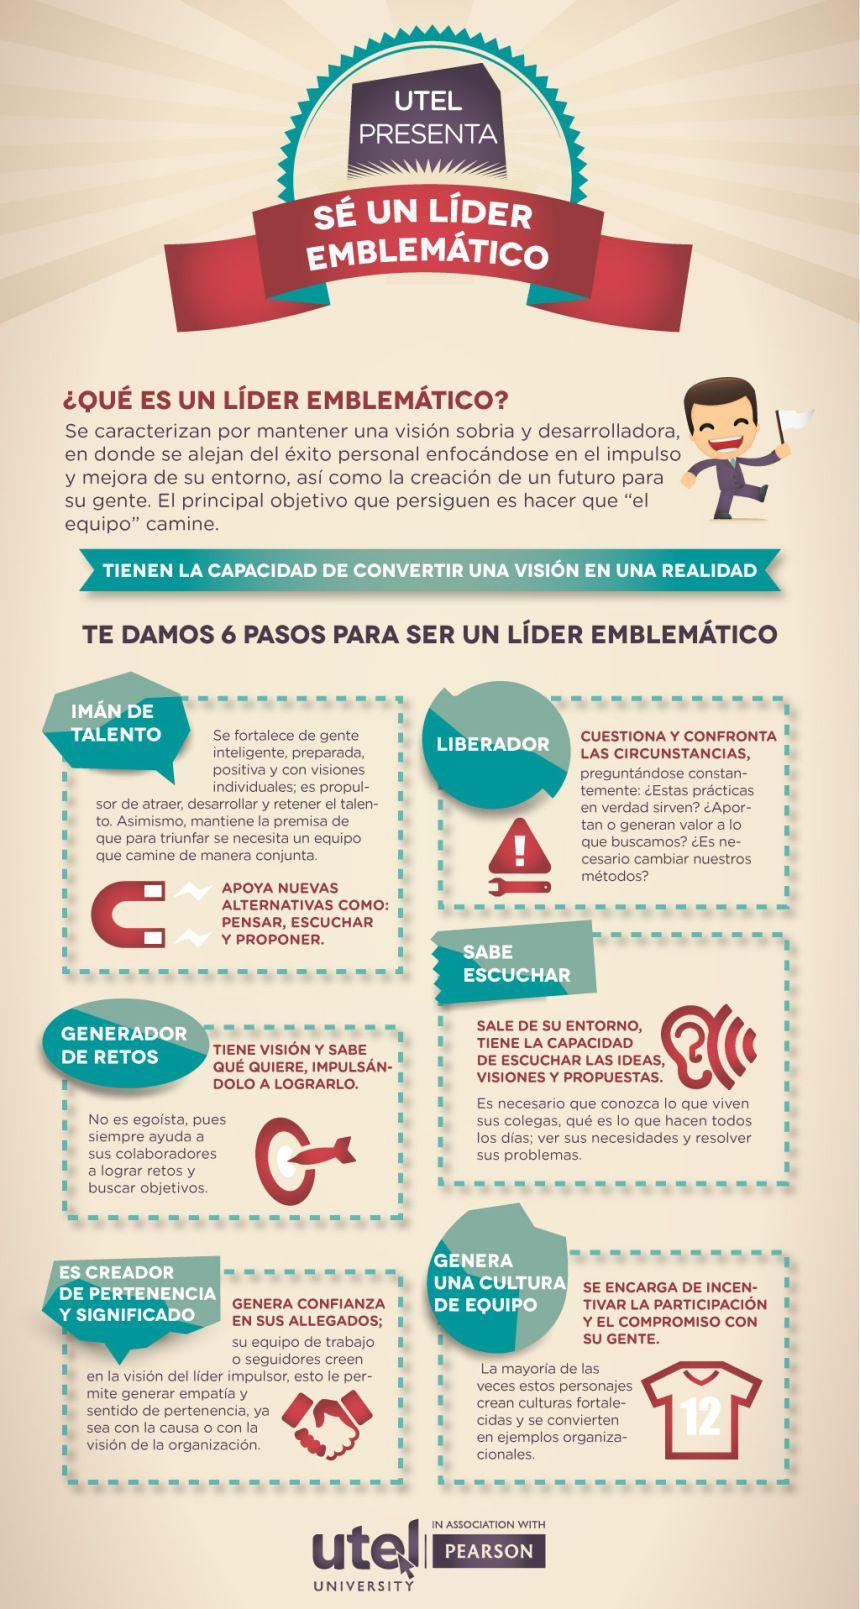 6 pasos para ser un líder emblemático #infografia #infographic ...